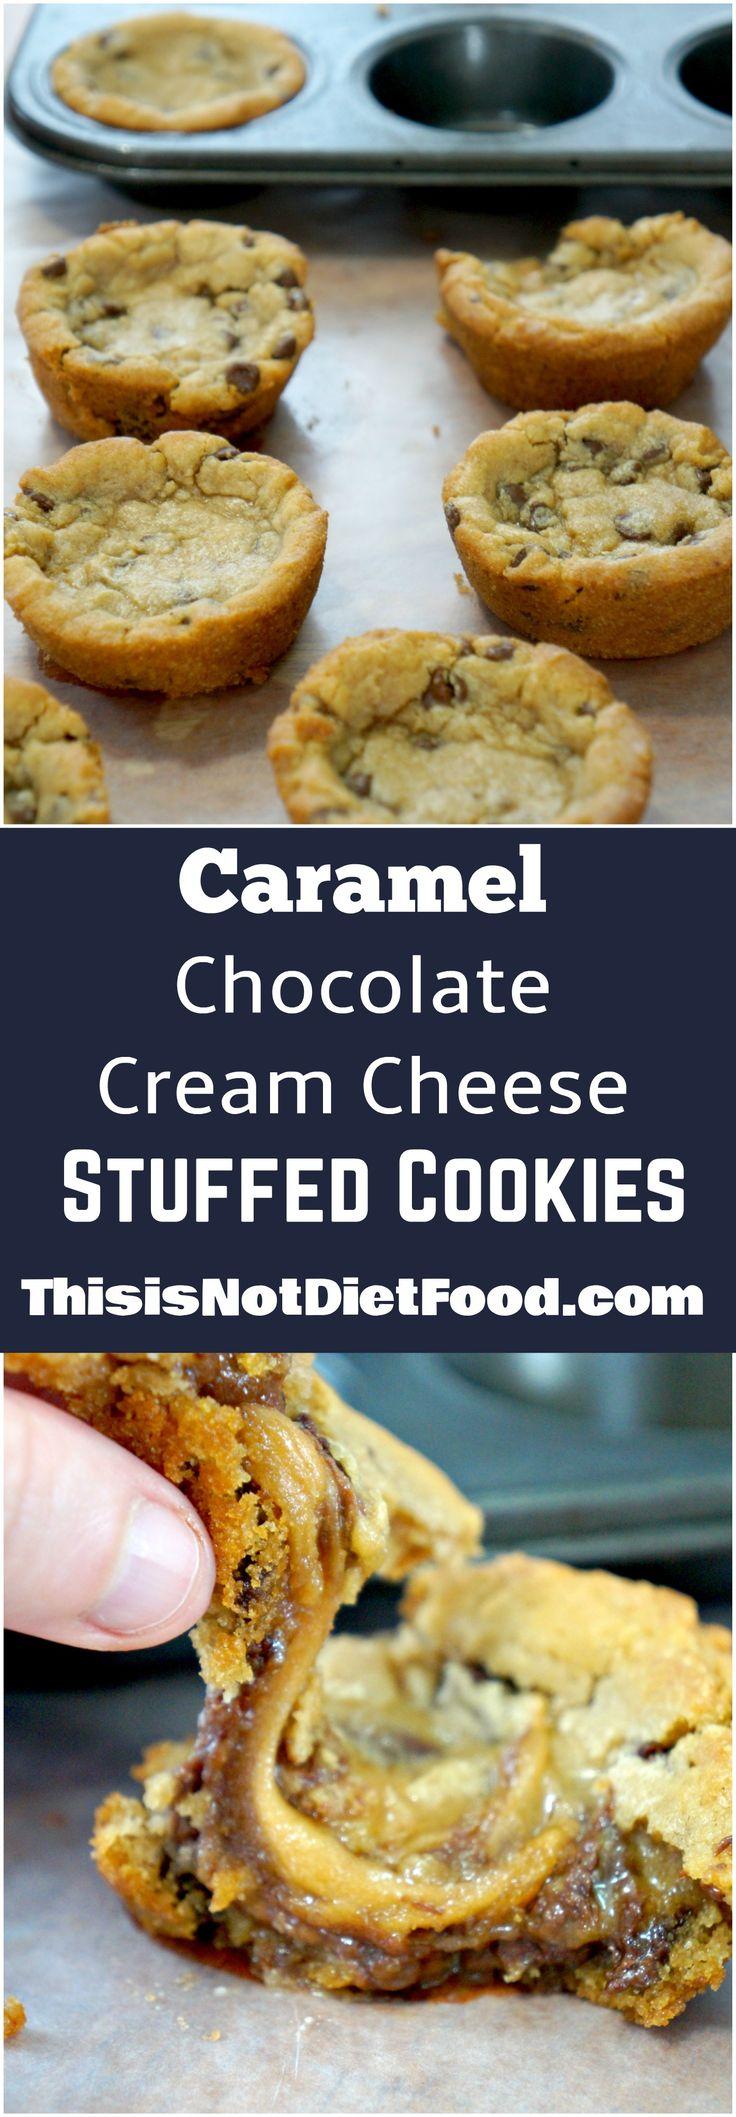 Chocolate Chip Cookies stuffed with Caramel and Chocolate Cream Cheese. Easy muffin tin cookies using Pillsbury chocolate chip cookie dough.